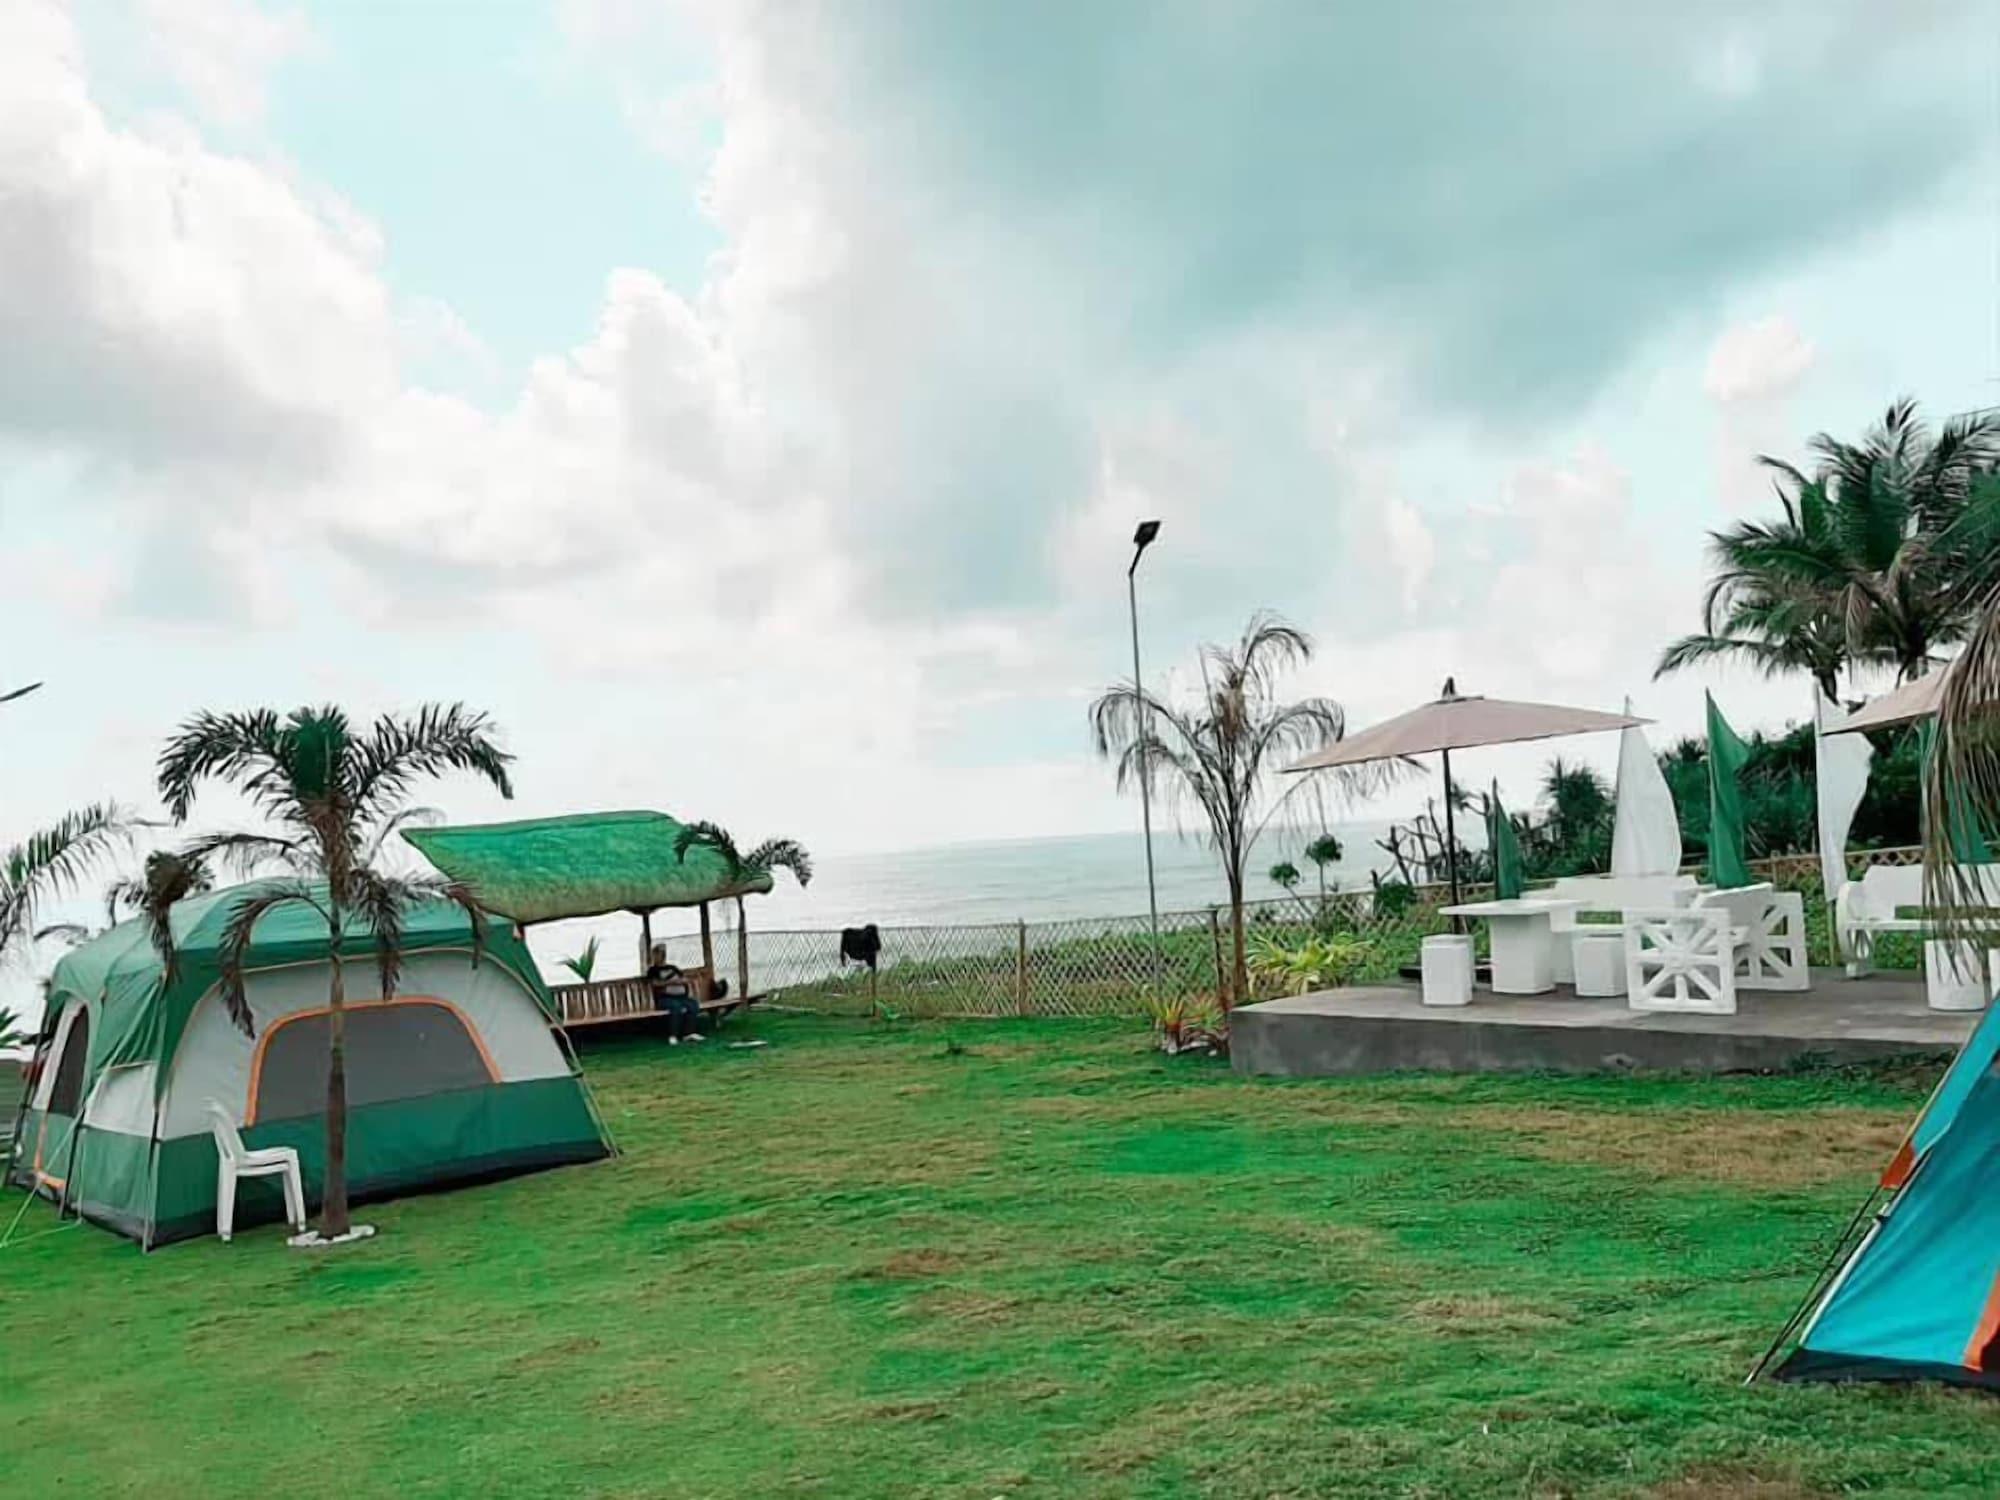 Pacific Buddies - Campsite, Dingalan